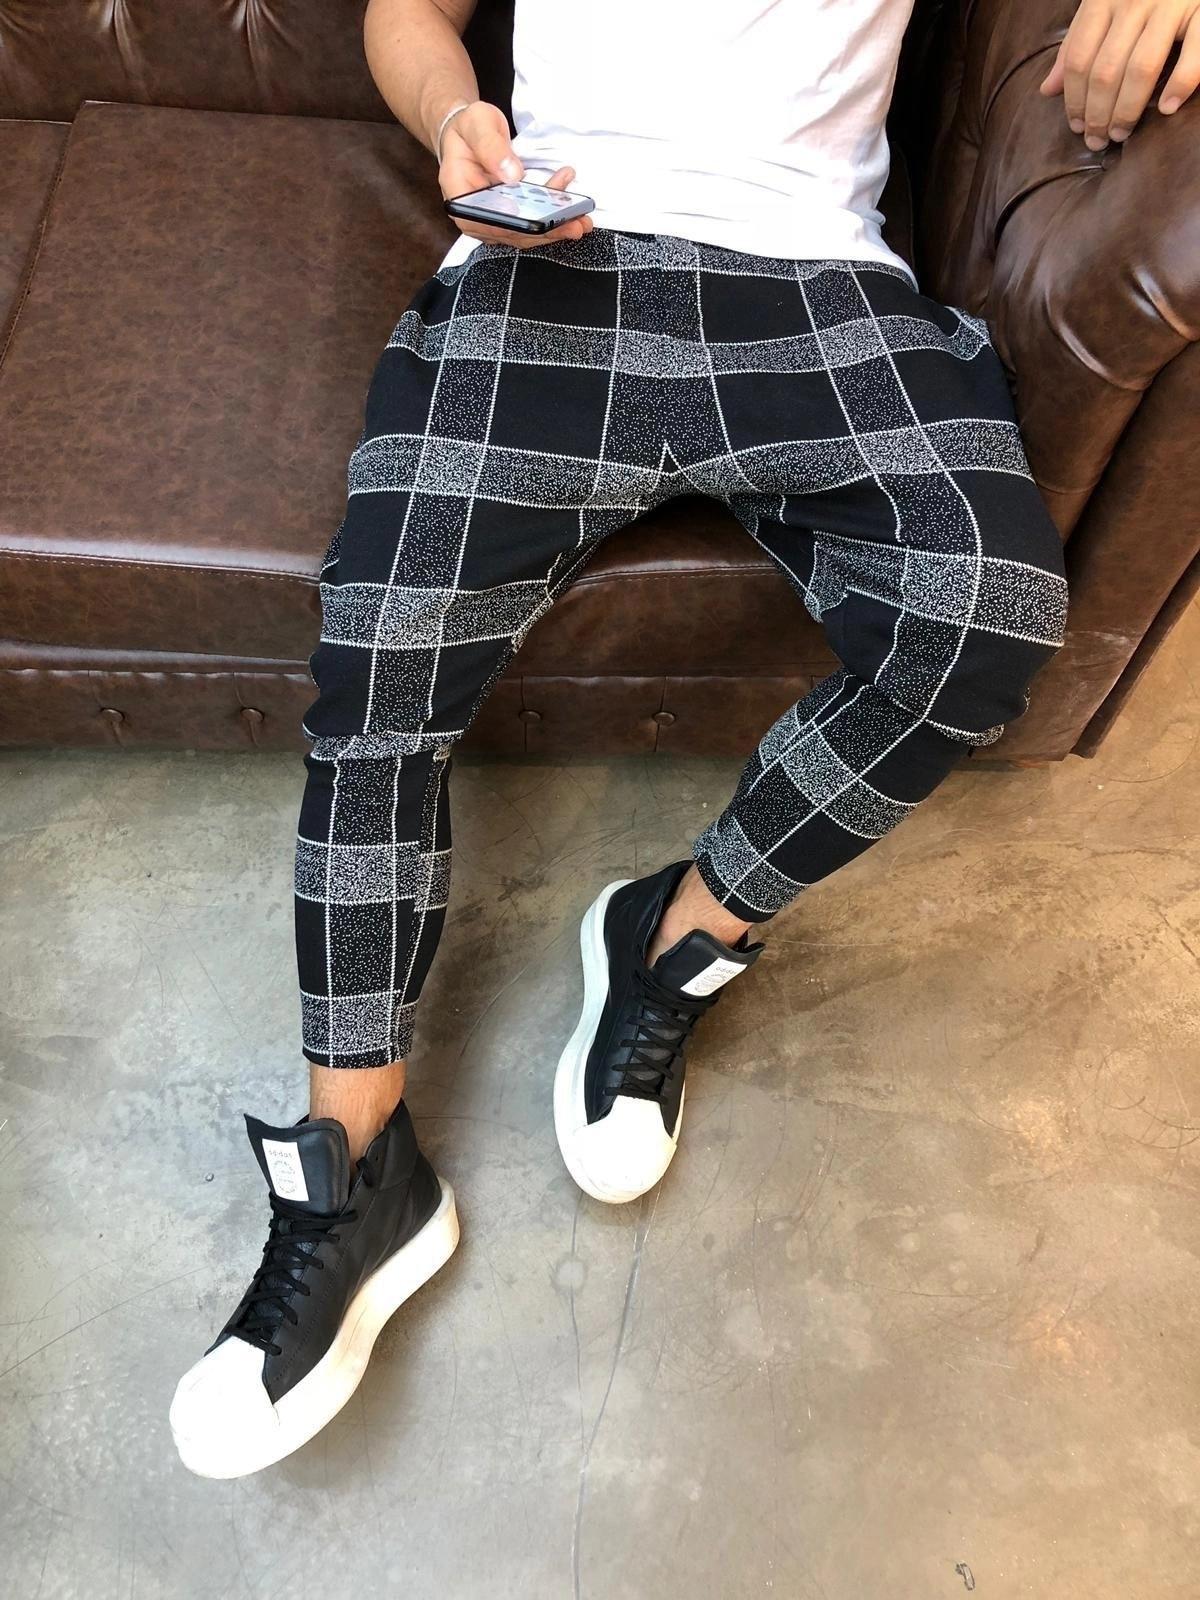 Mens Fashion Plaid Pants Elastic Waist Harem Trousers Streetwear Causal Pencil Joggers Sweatpants Men Pantalon Plus Size M 3XL in Harem Pants from Men 39 s Clothing